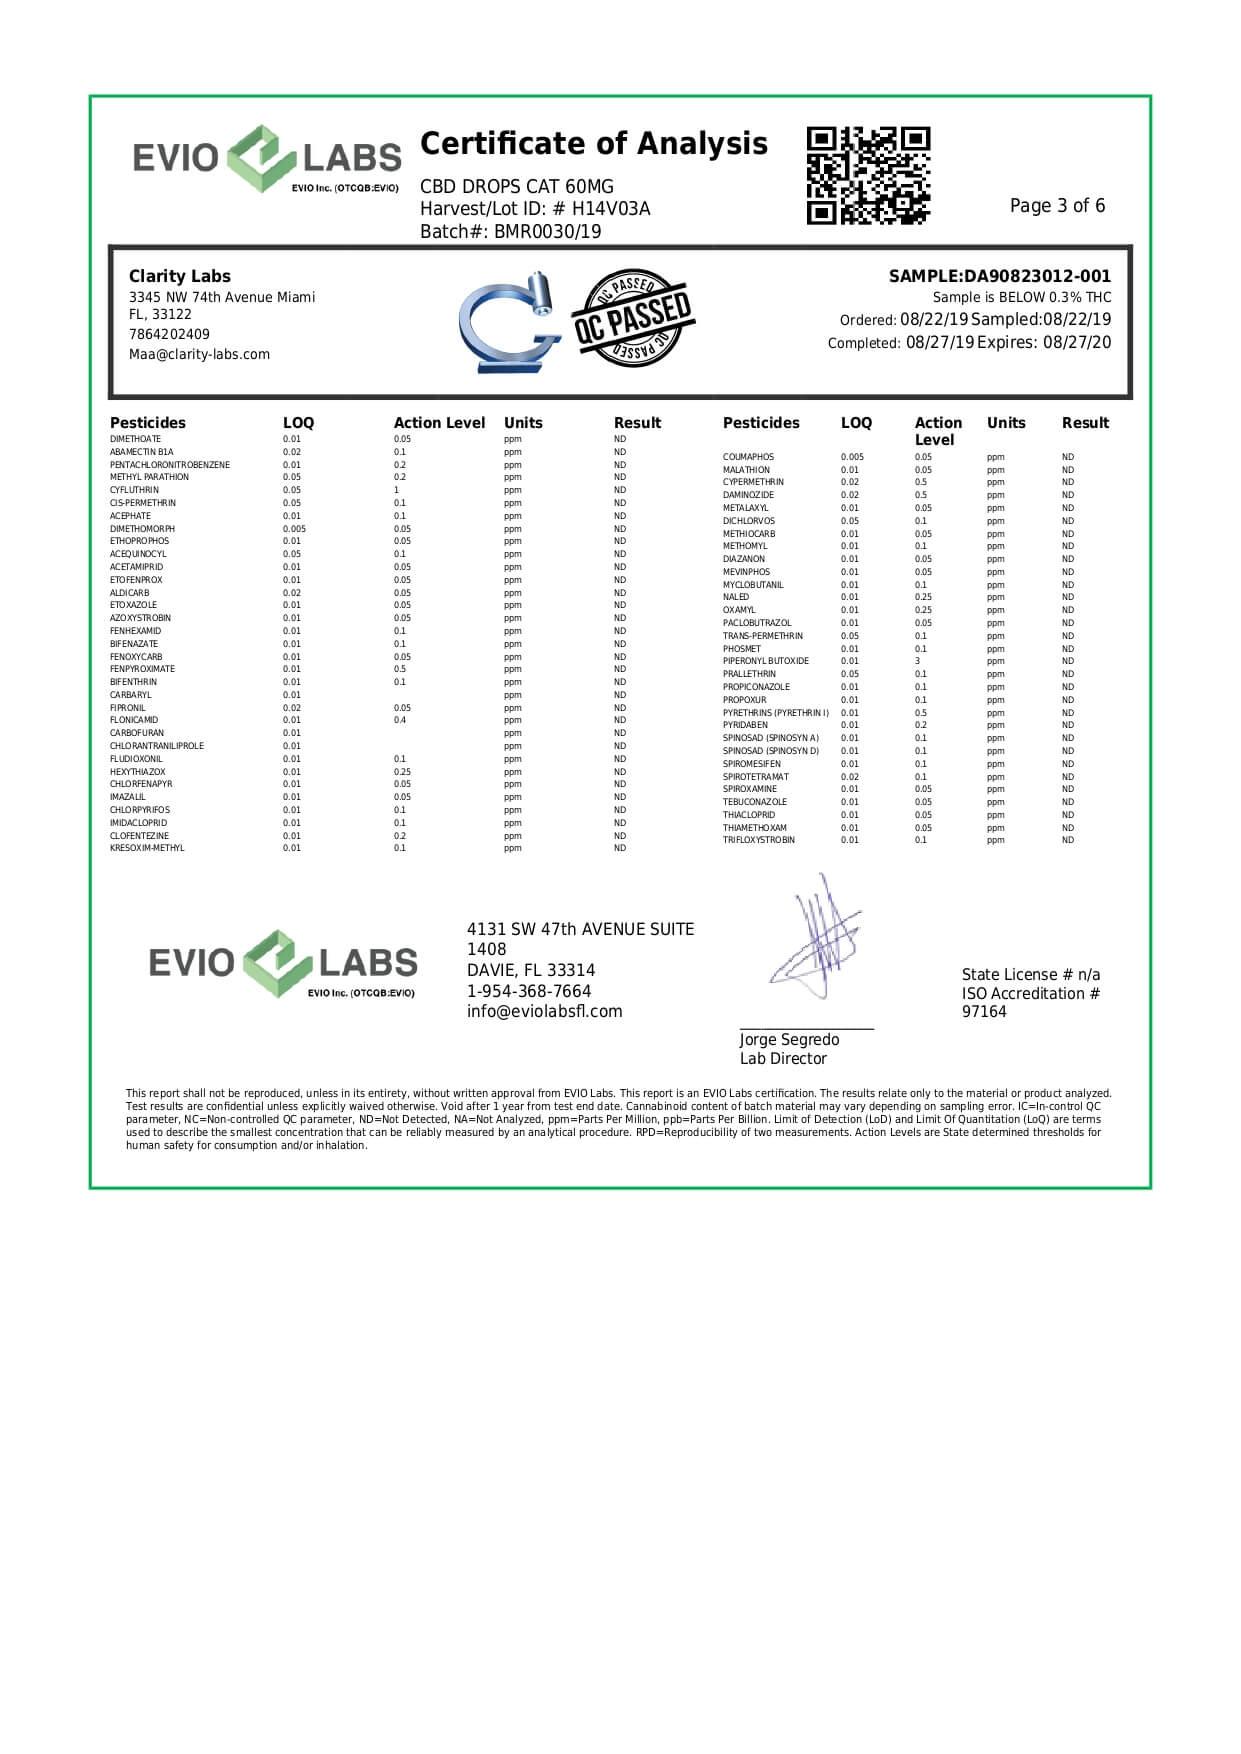 Green Roads CBD Pet Tincture CBD Drops Cat Formula Lab Report